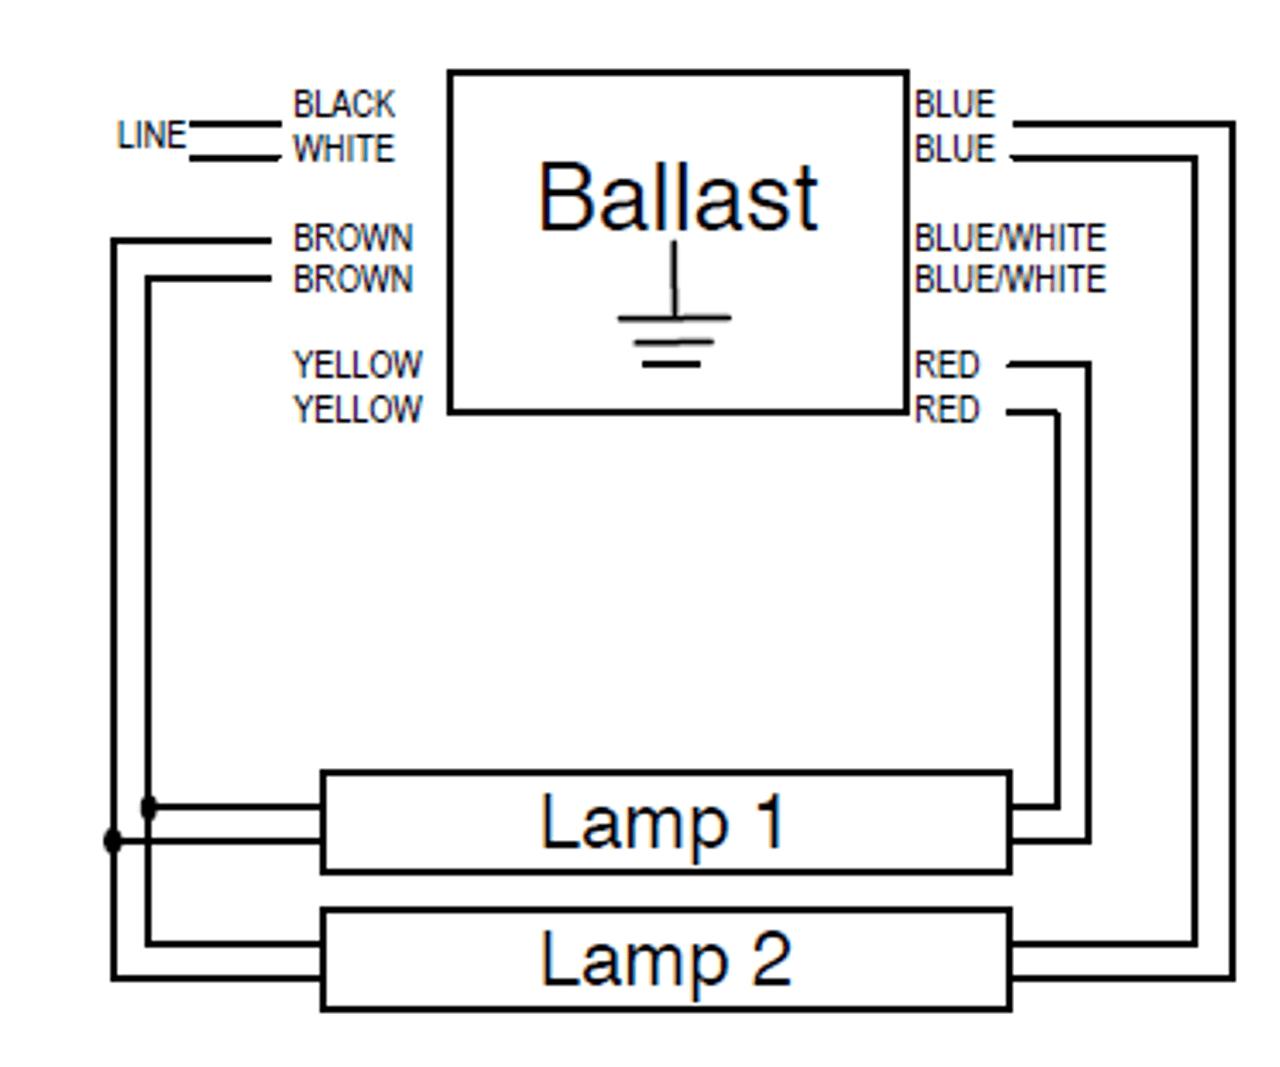 keystone ktsb 1224 24 1 tp magnetic sign ballast 12 to 24 total keystone ballasts wiring diagram sign [ 1280 x 1067 Pixel ]